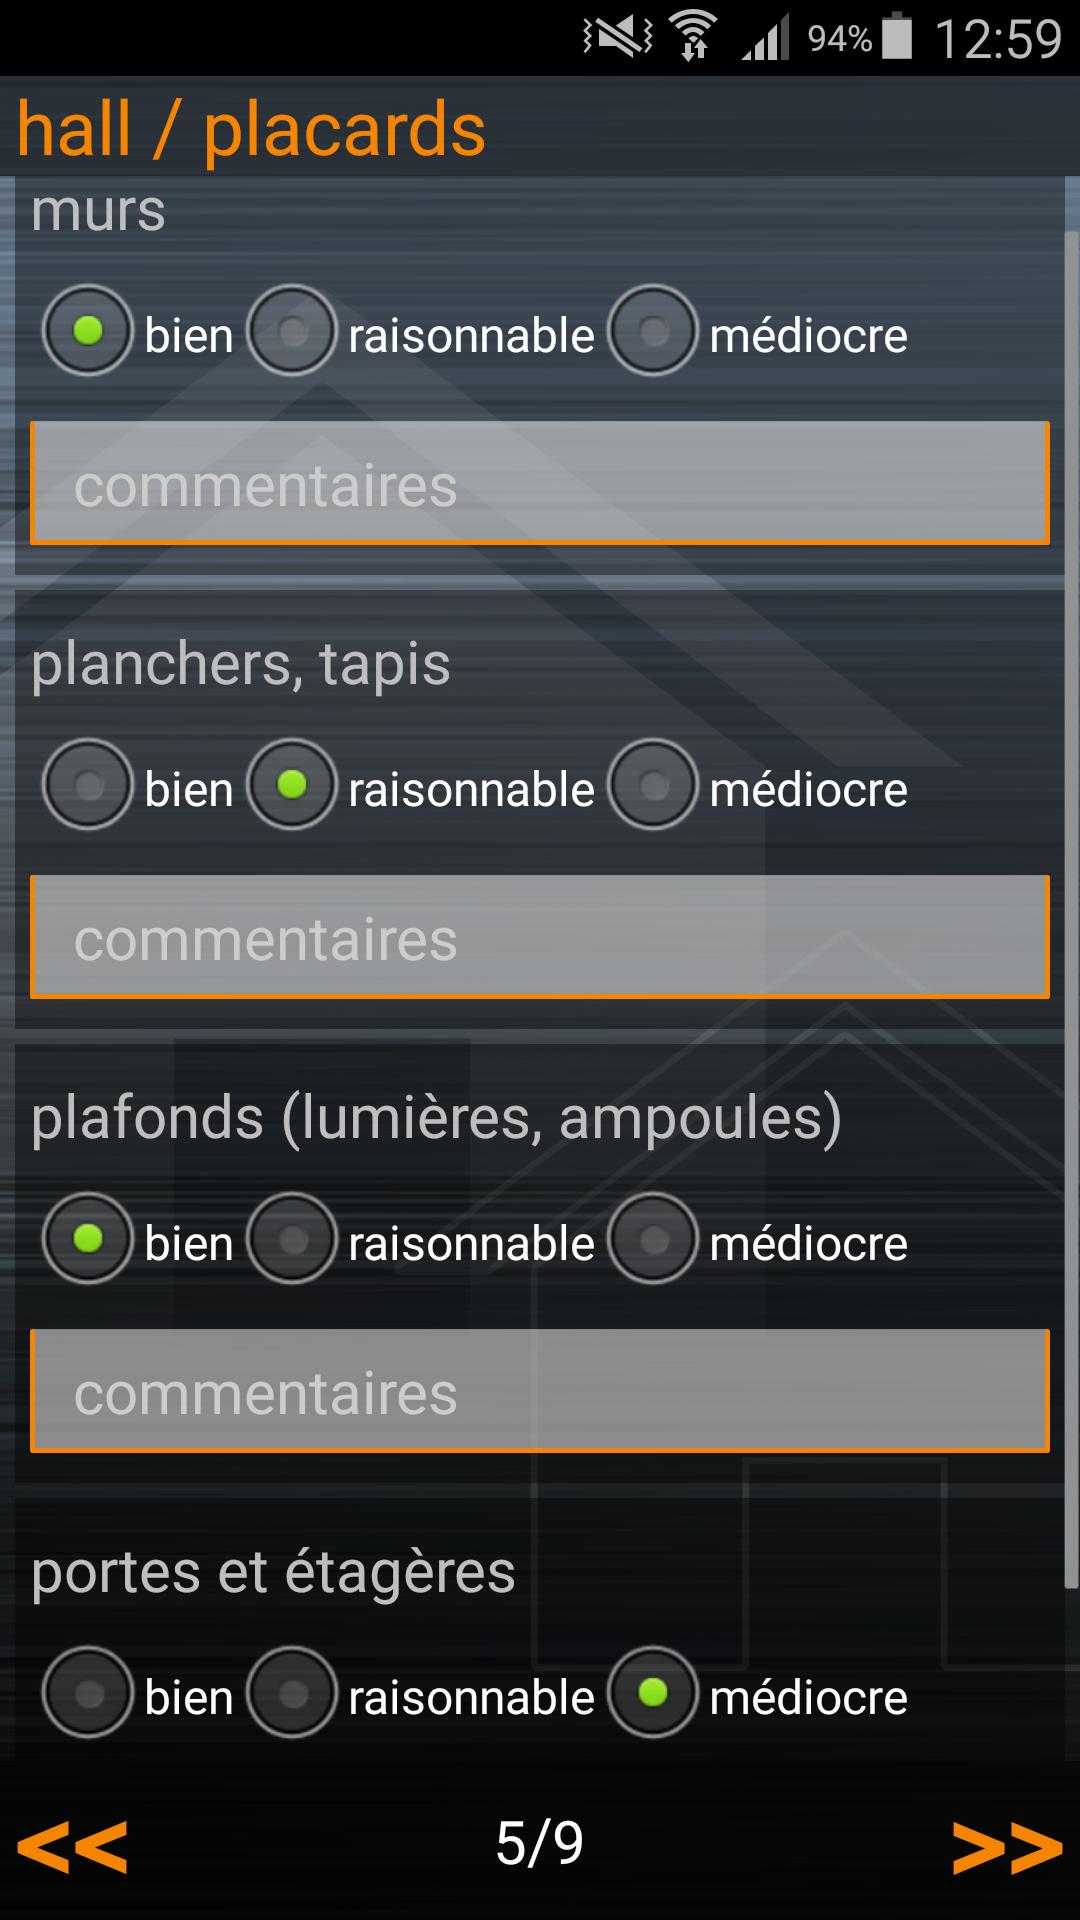 ginstr_app_flatHandoverChecklist_FR_7